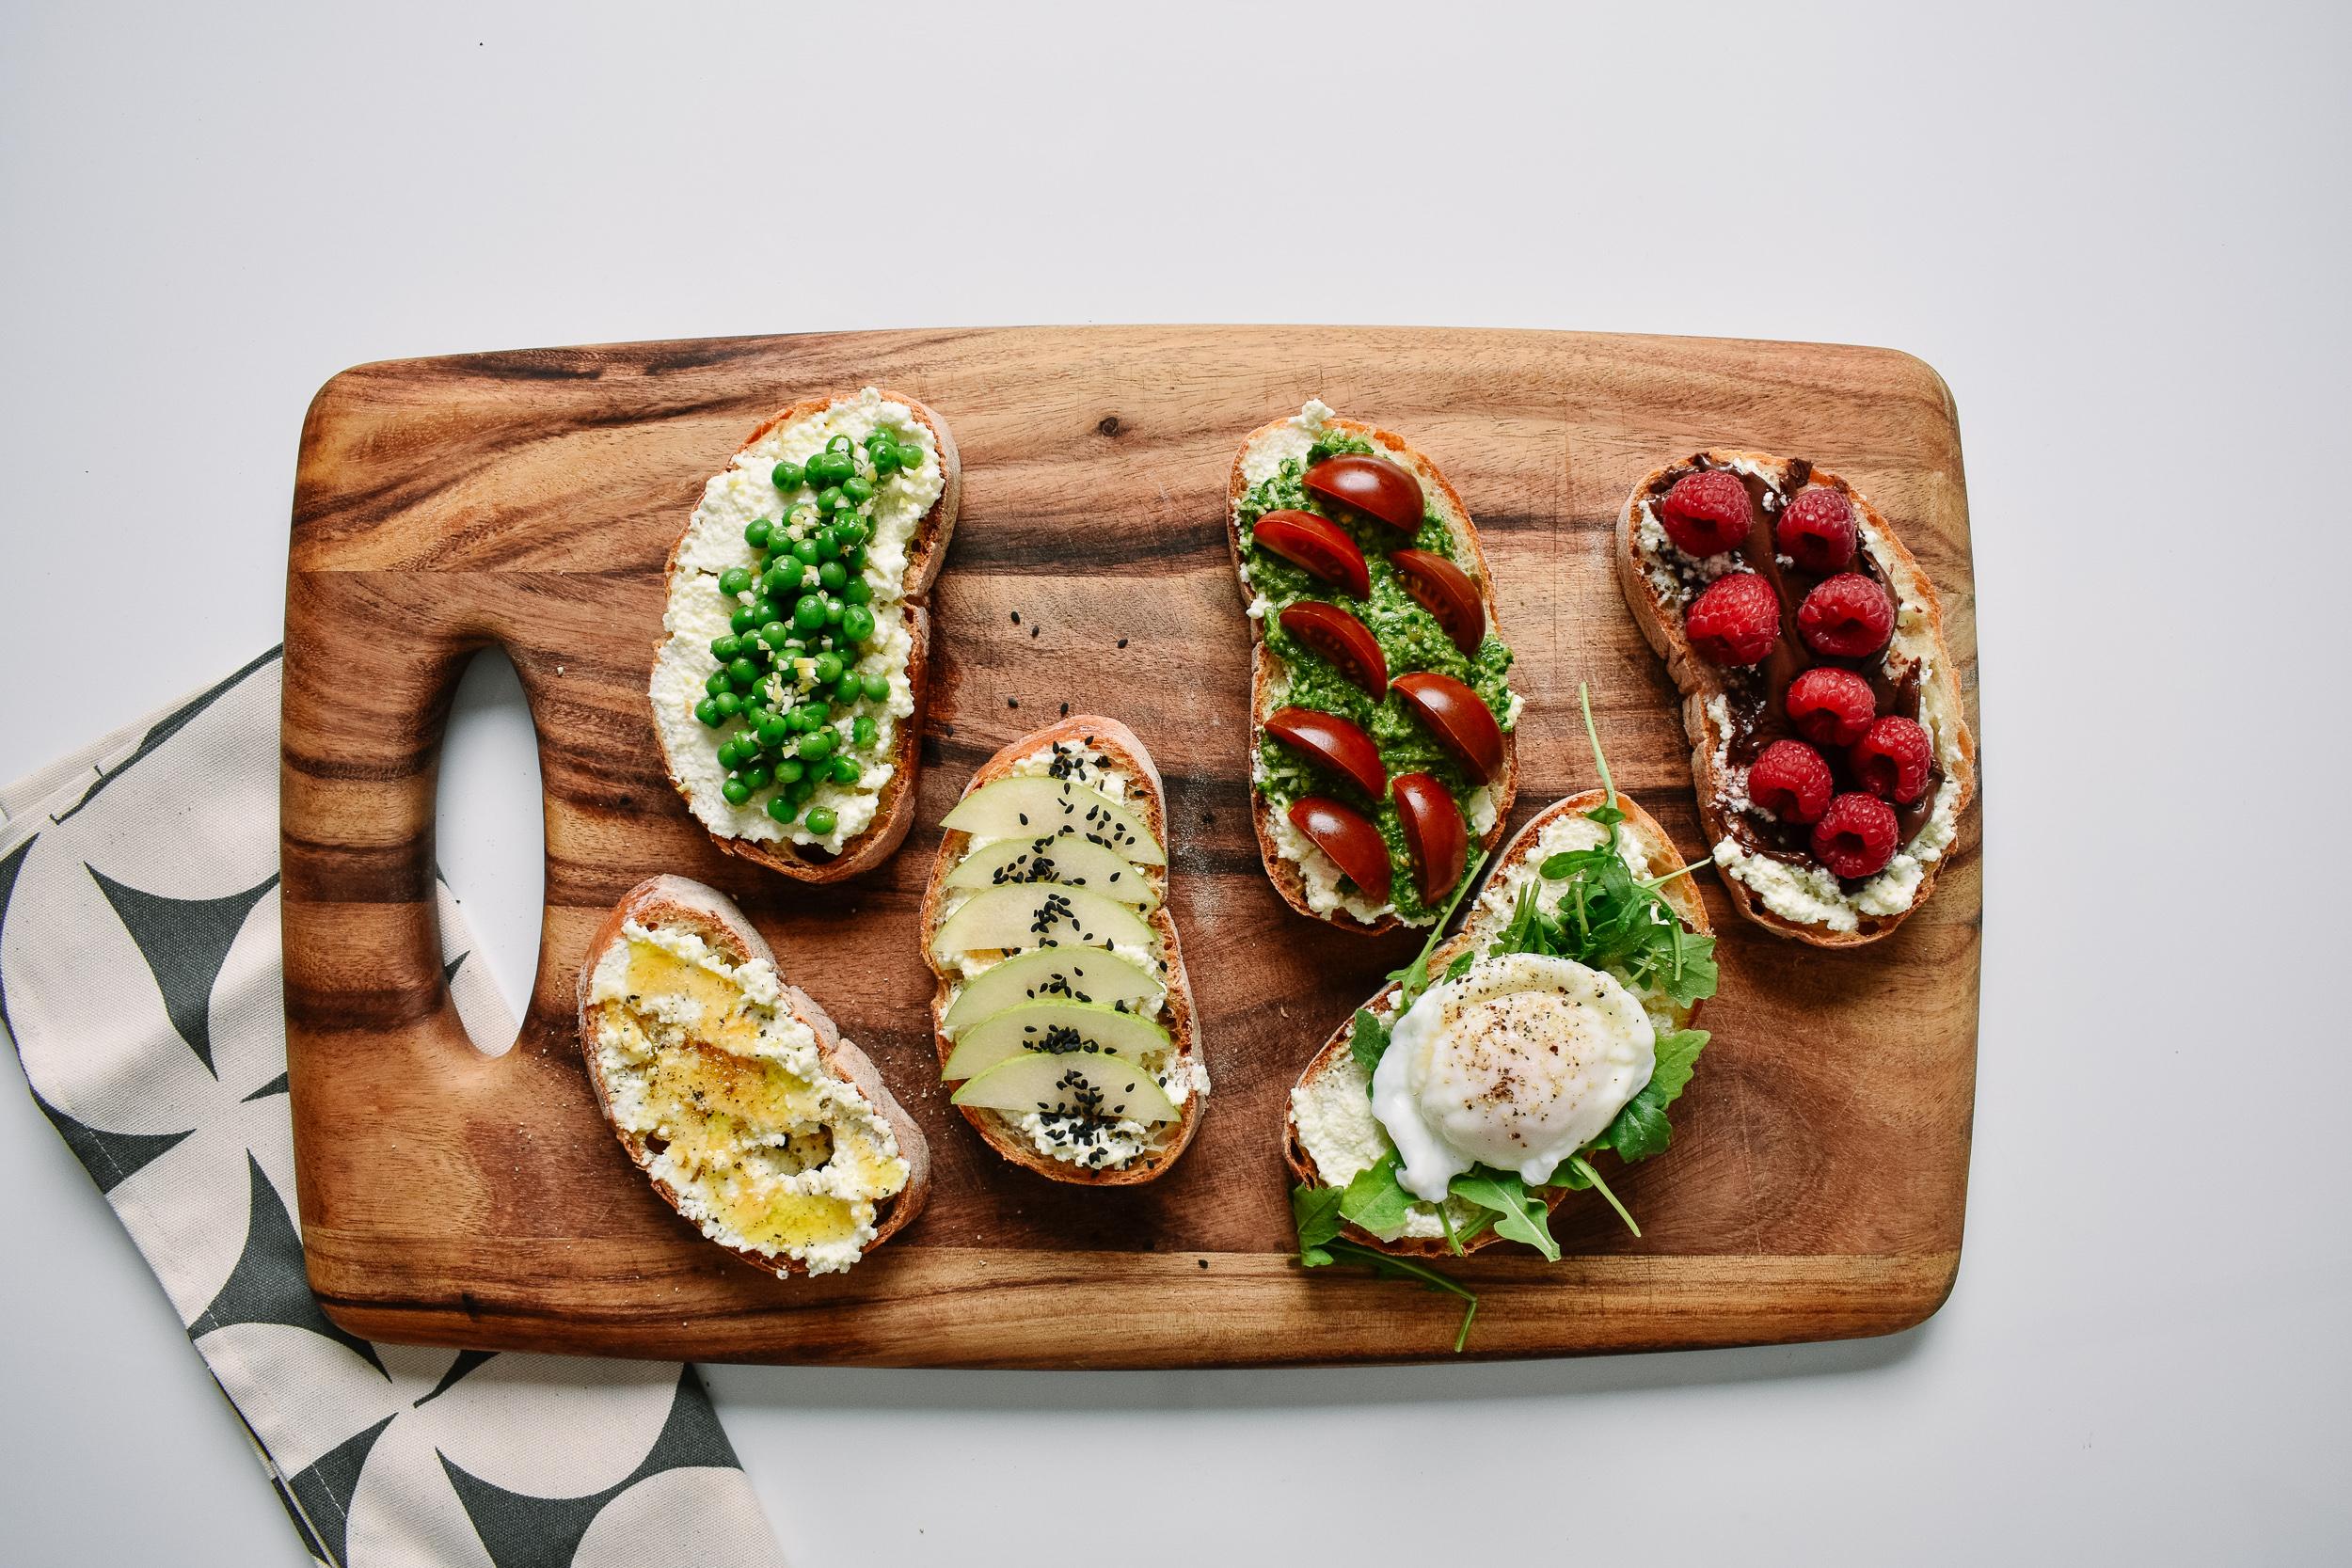 Six Ways to Make Ricotta Toast - With tomatoes + pesto.